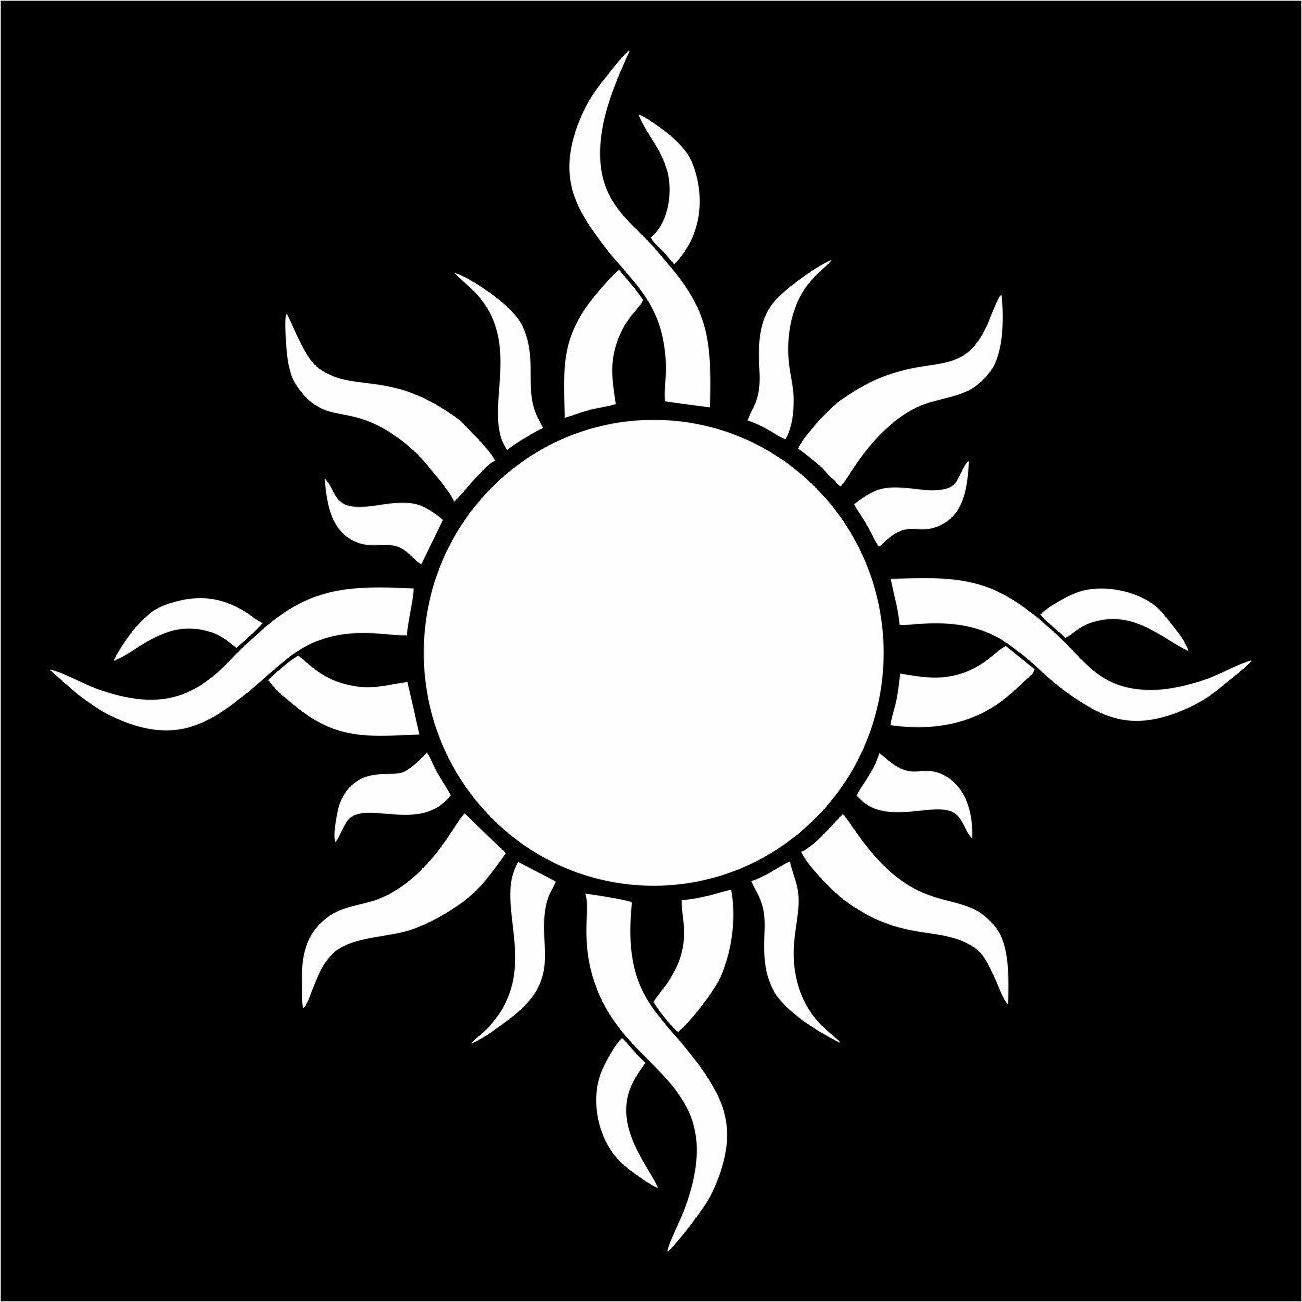 Sun Decal Window Art SUV